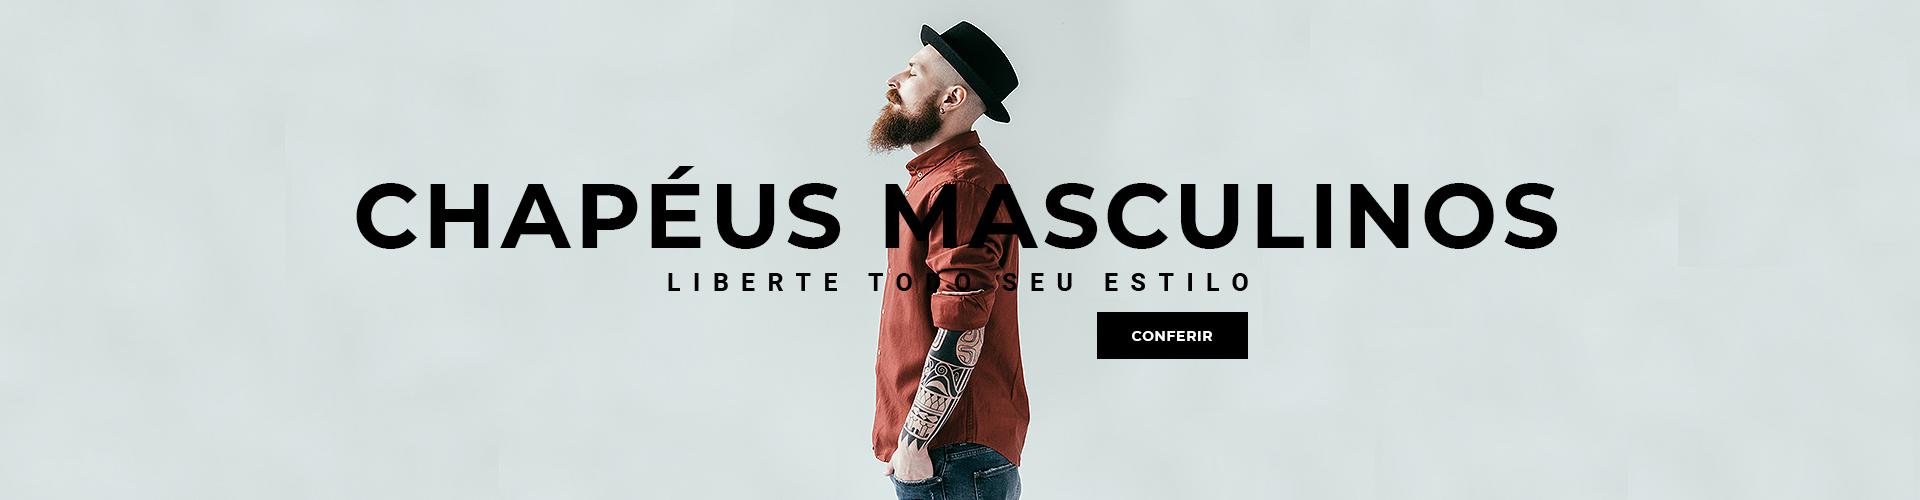 Banner Chapéus Masculinos